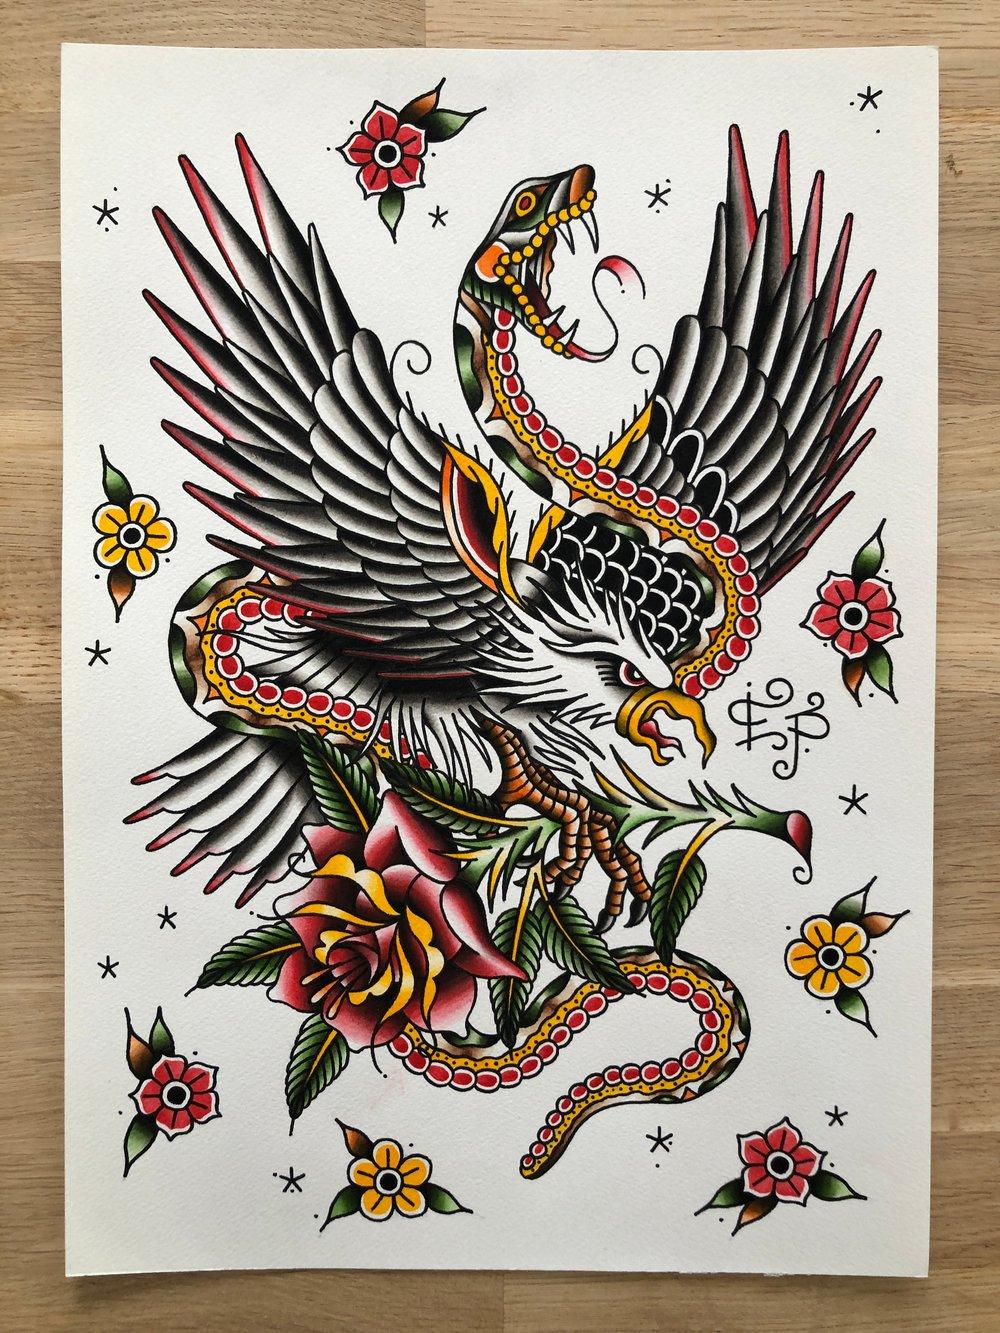 Image of Eagle vs Snake - Original painting